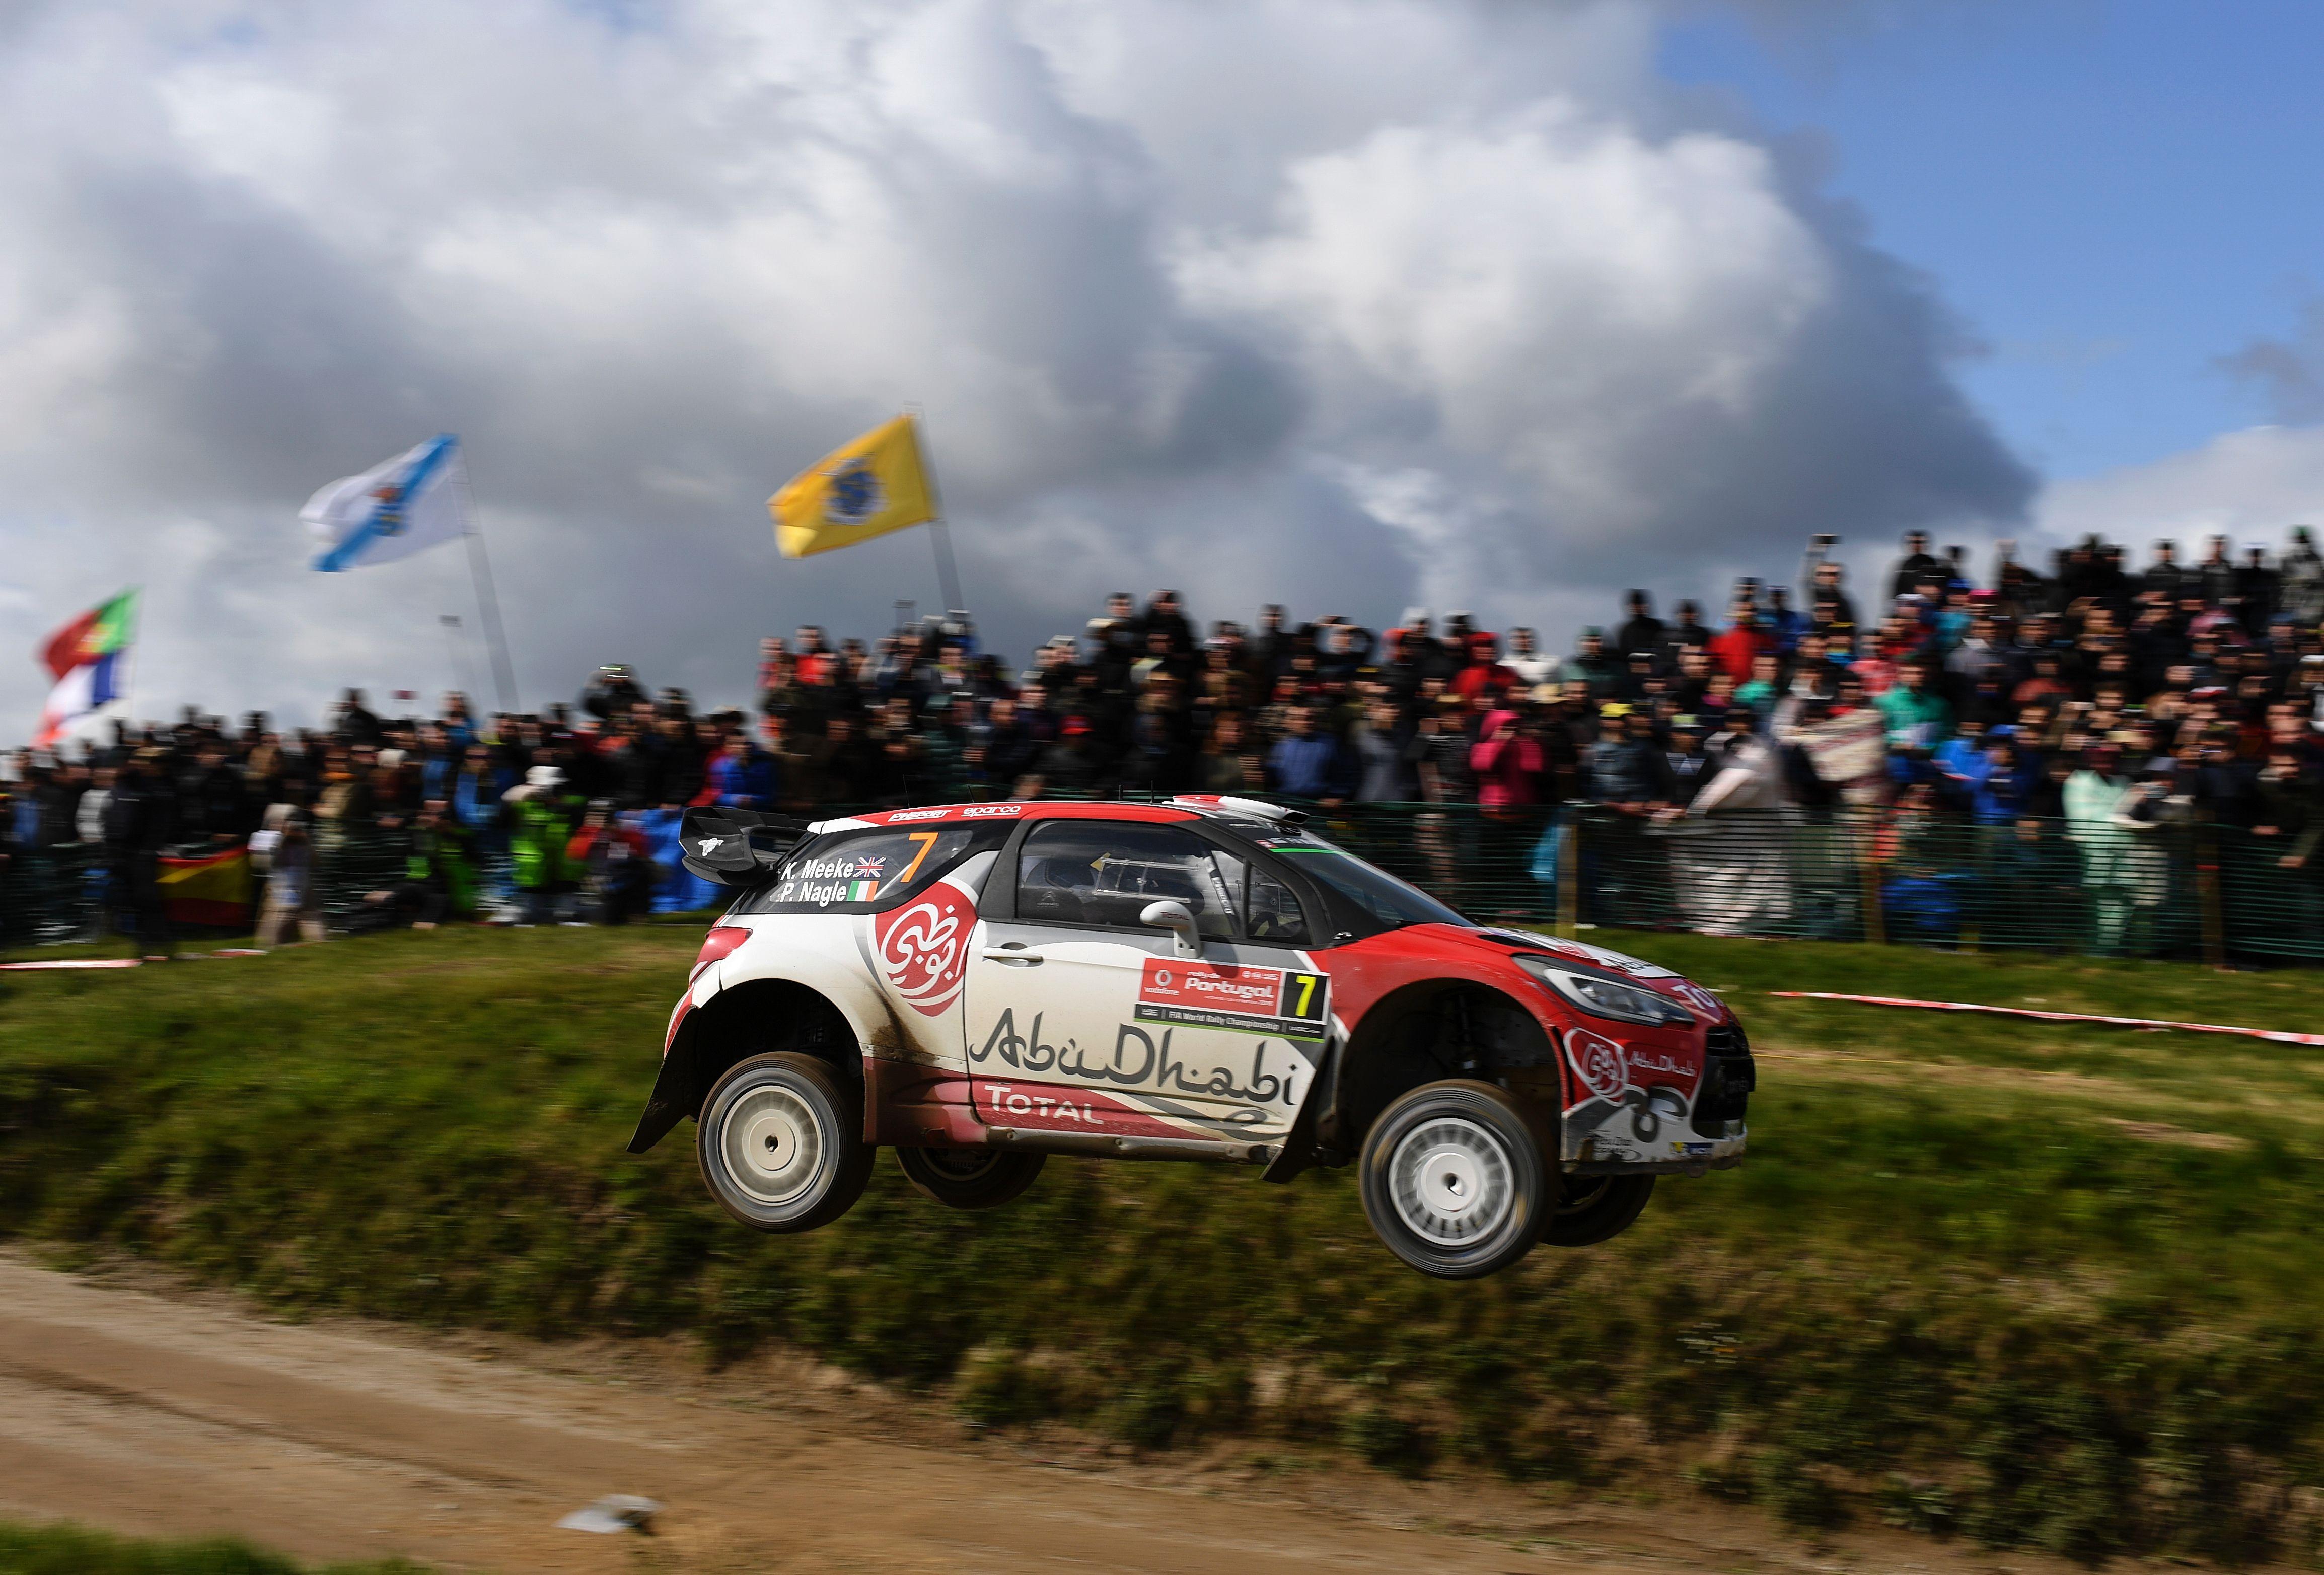 Rallye - Meeke soigne son retour au Portugal, Ogier seulement 3e